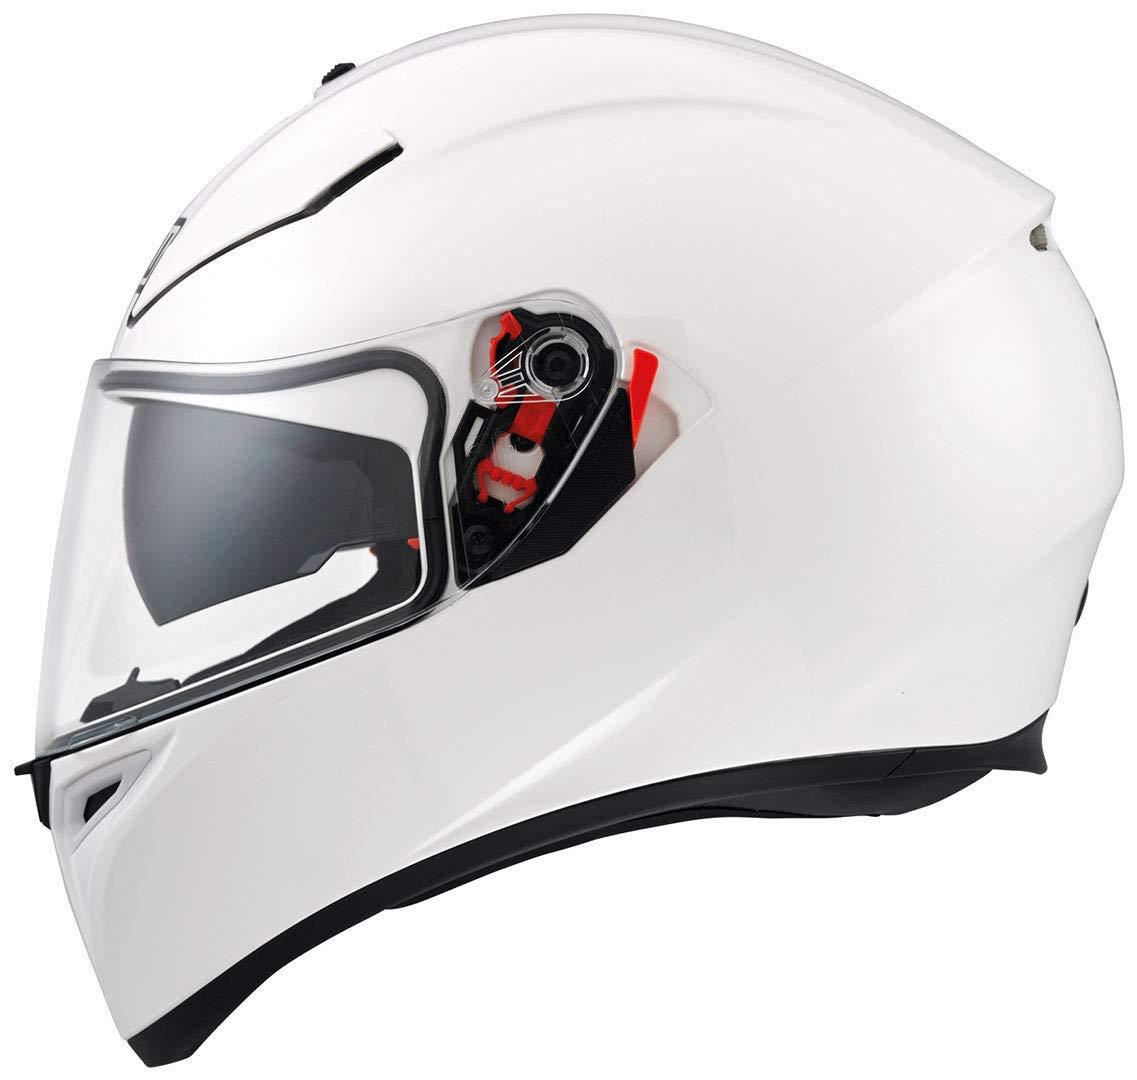 Matt Black Gr/ö/ße MS AGV 0301A4EY/_002/_MS K-3 SV E2205 Solid Helm